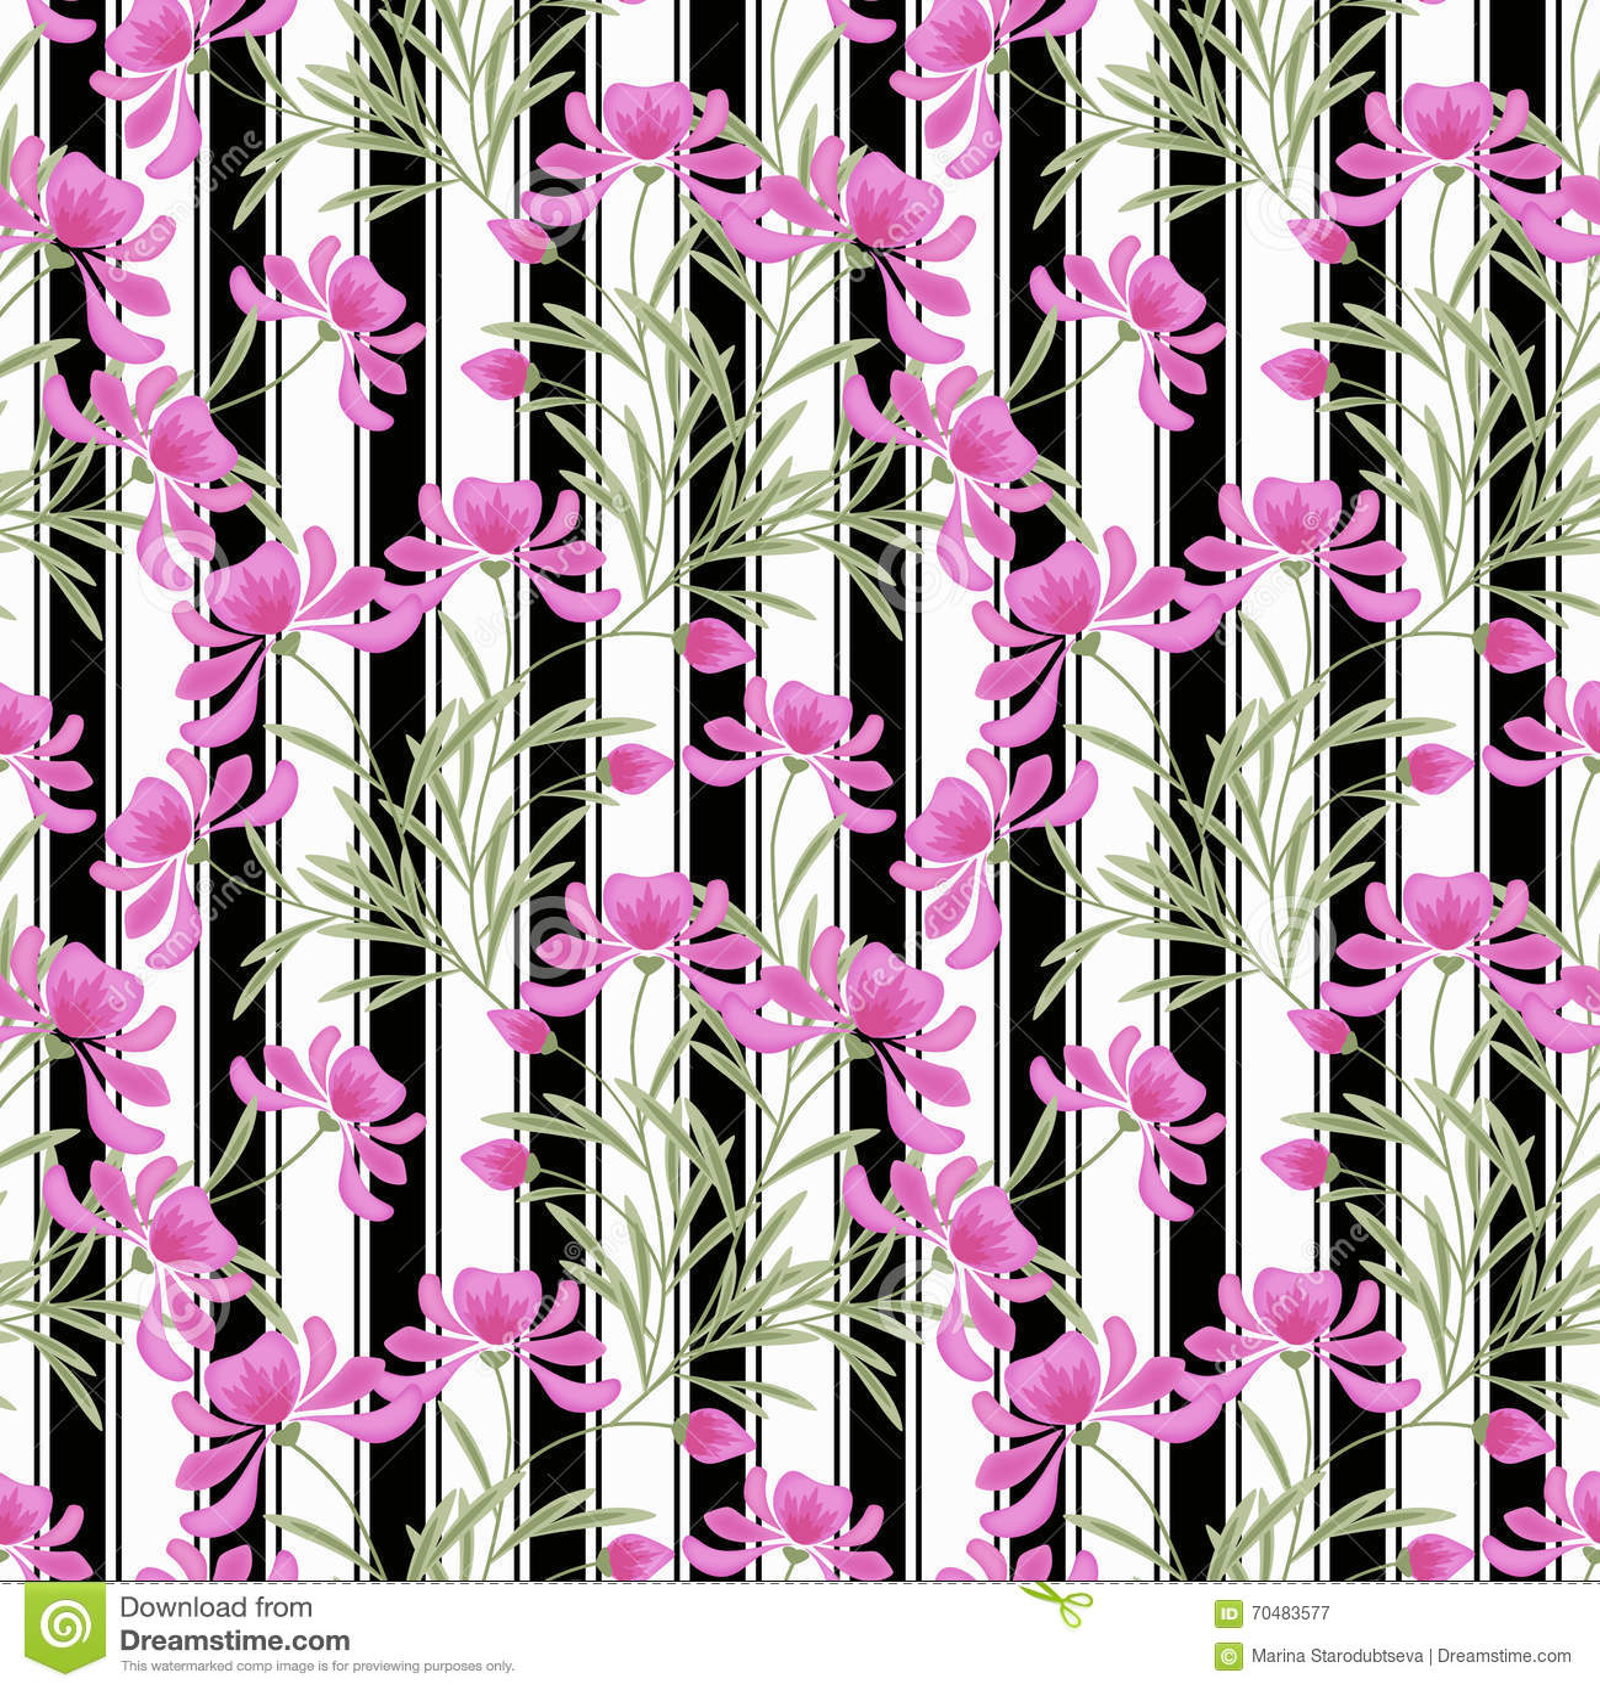 Floral seamless pattern cute cartoon pink flowers white black download floral seamless pattern cute cartoon pink flowers white black background striped stock illustration mightylinksfo